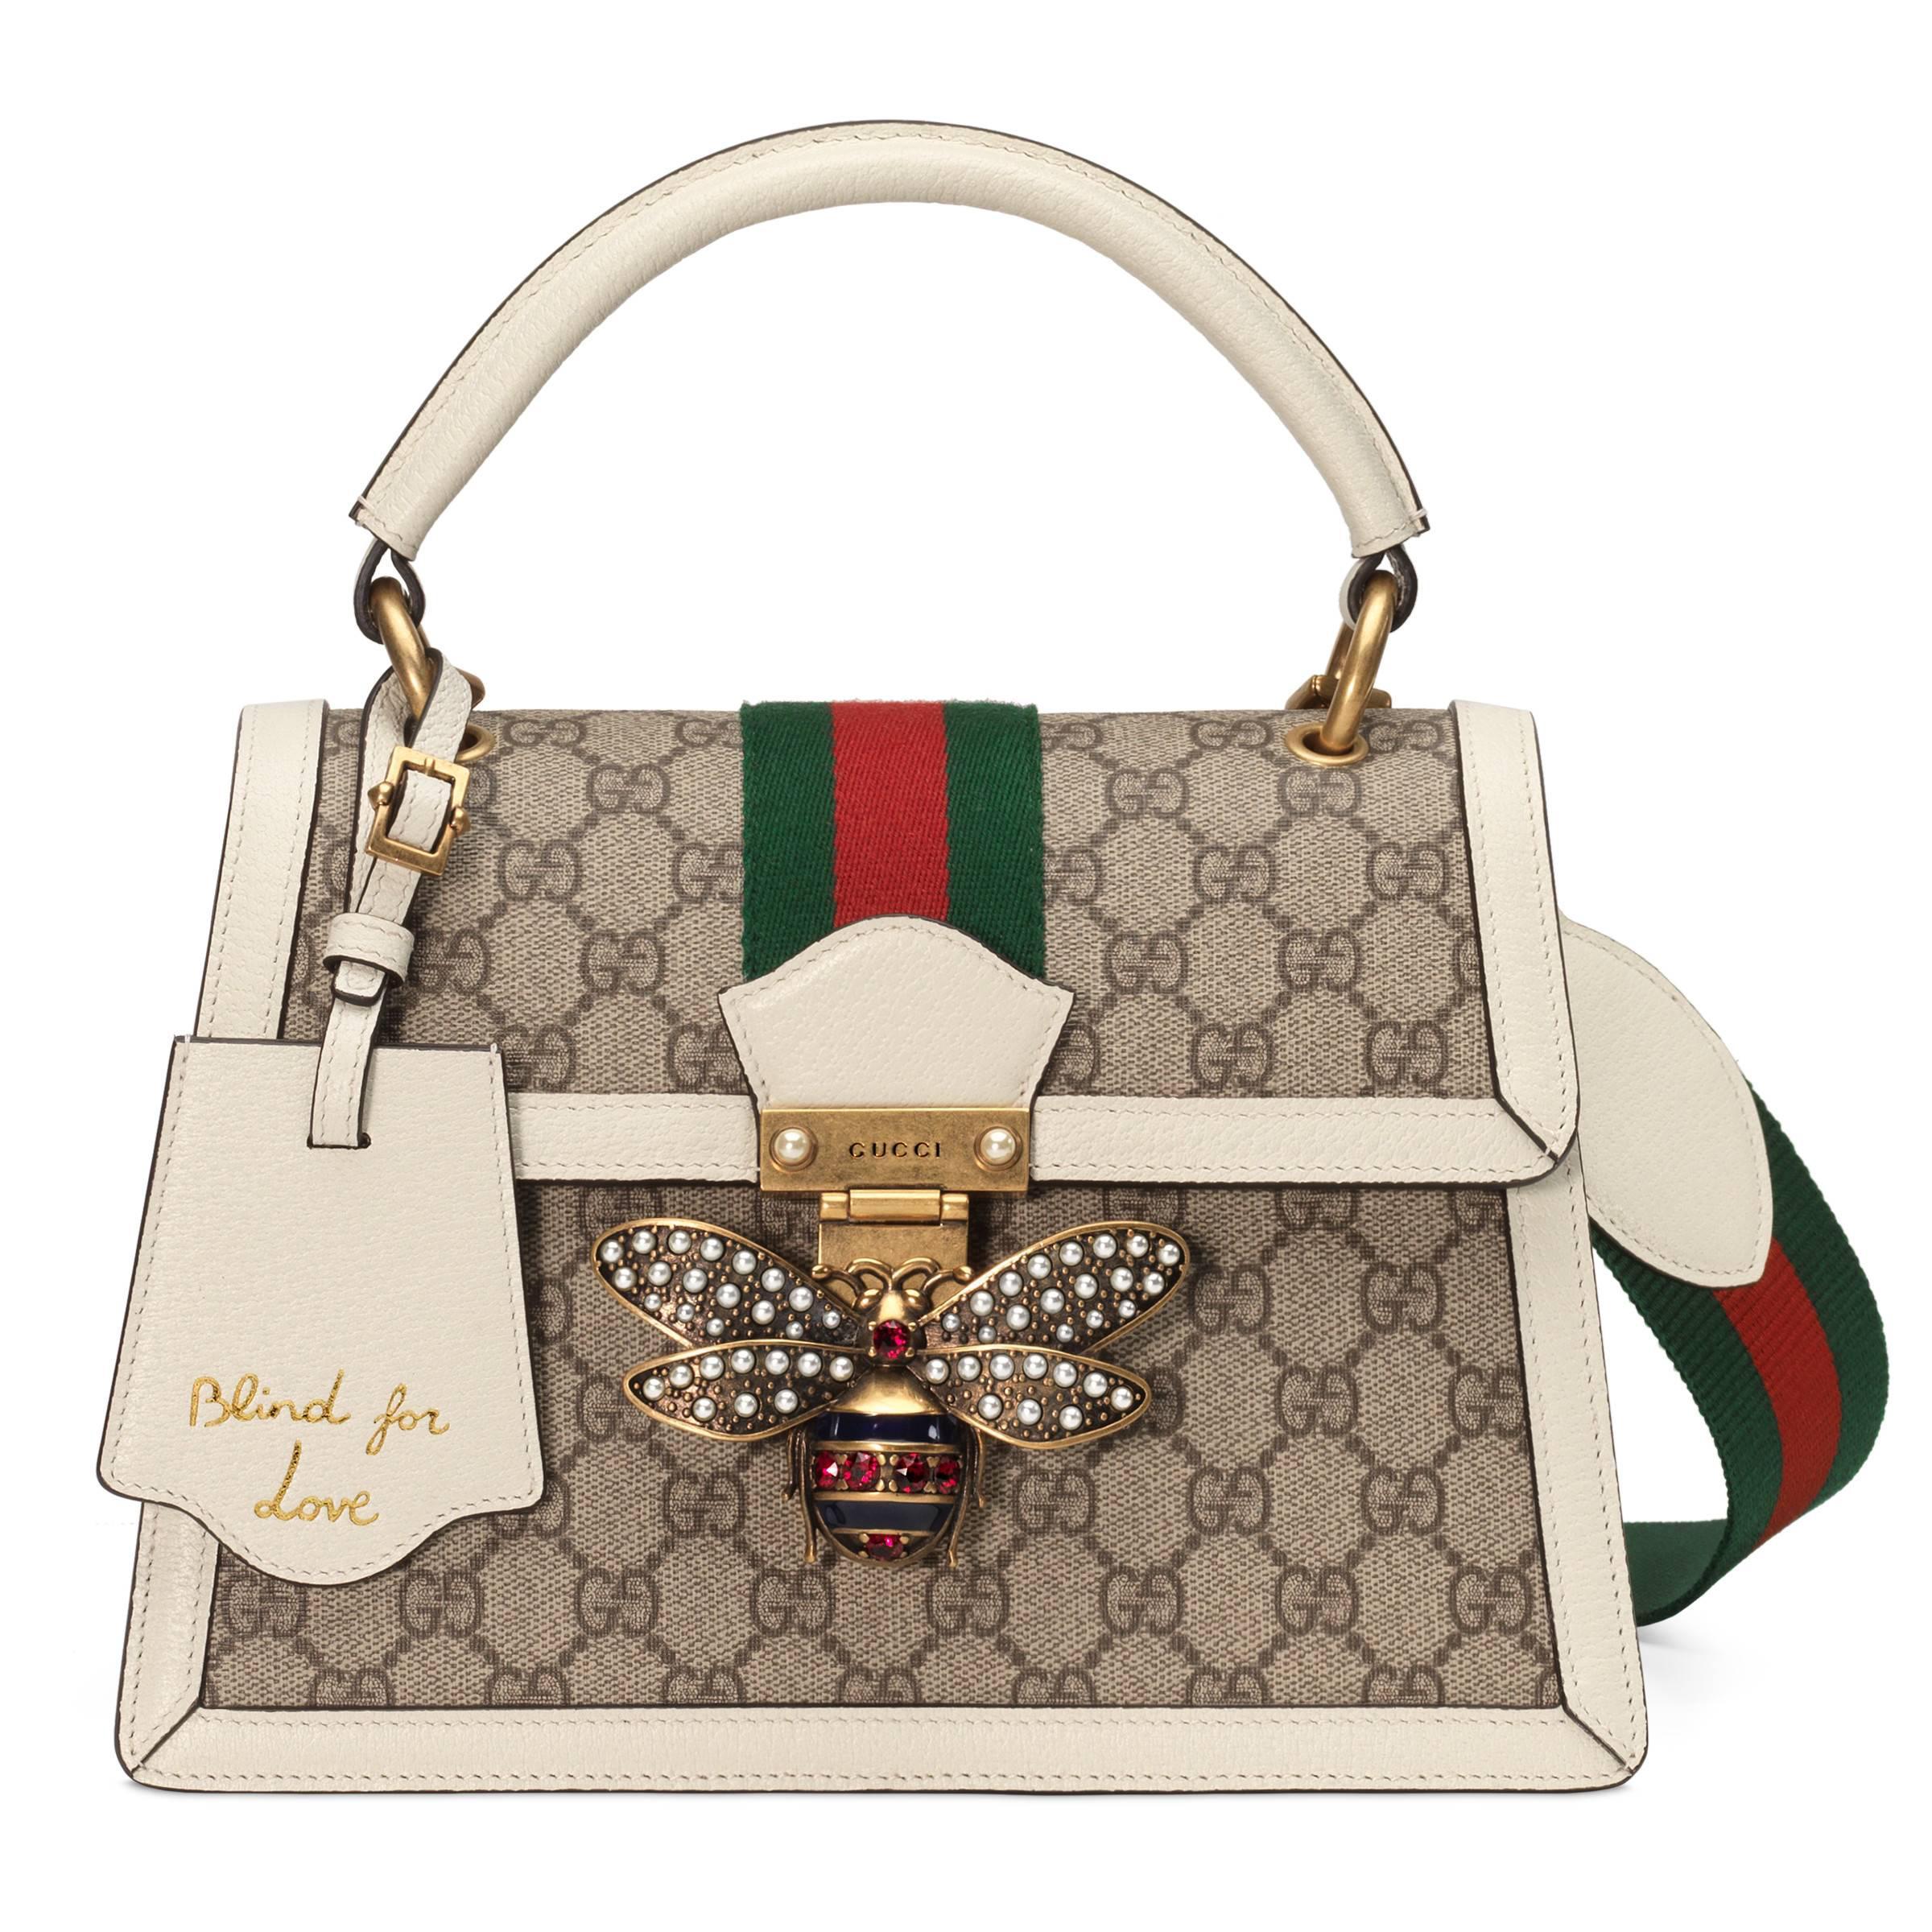 43b359605eb Gucci - Natural Queen Margaret Small GG Top Handle Bag - Lyst. View  fullscreen